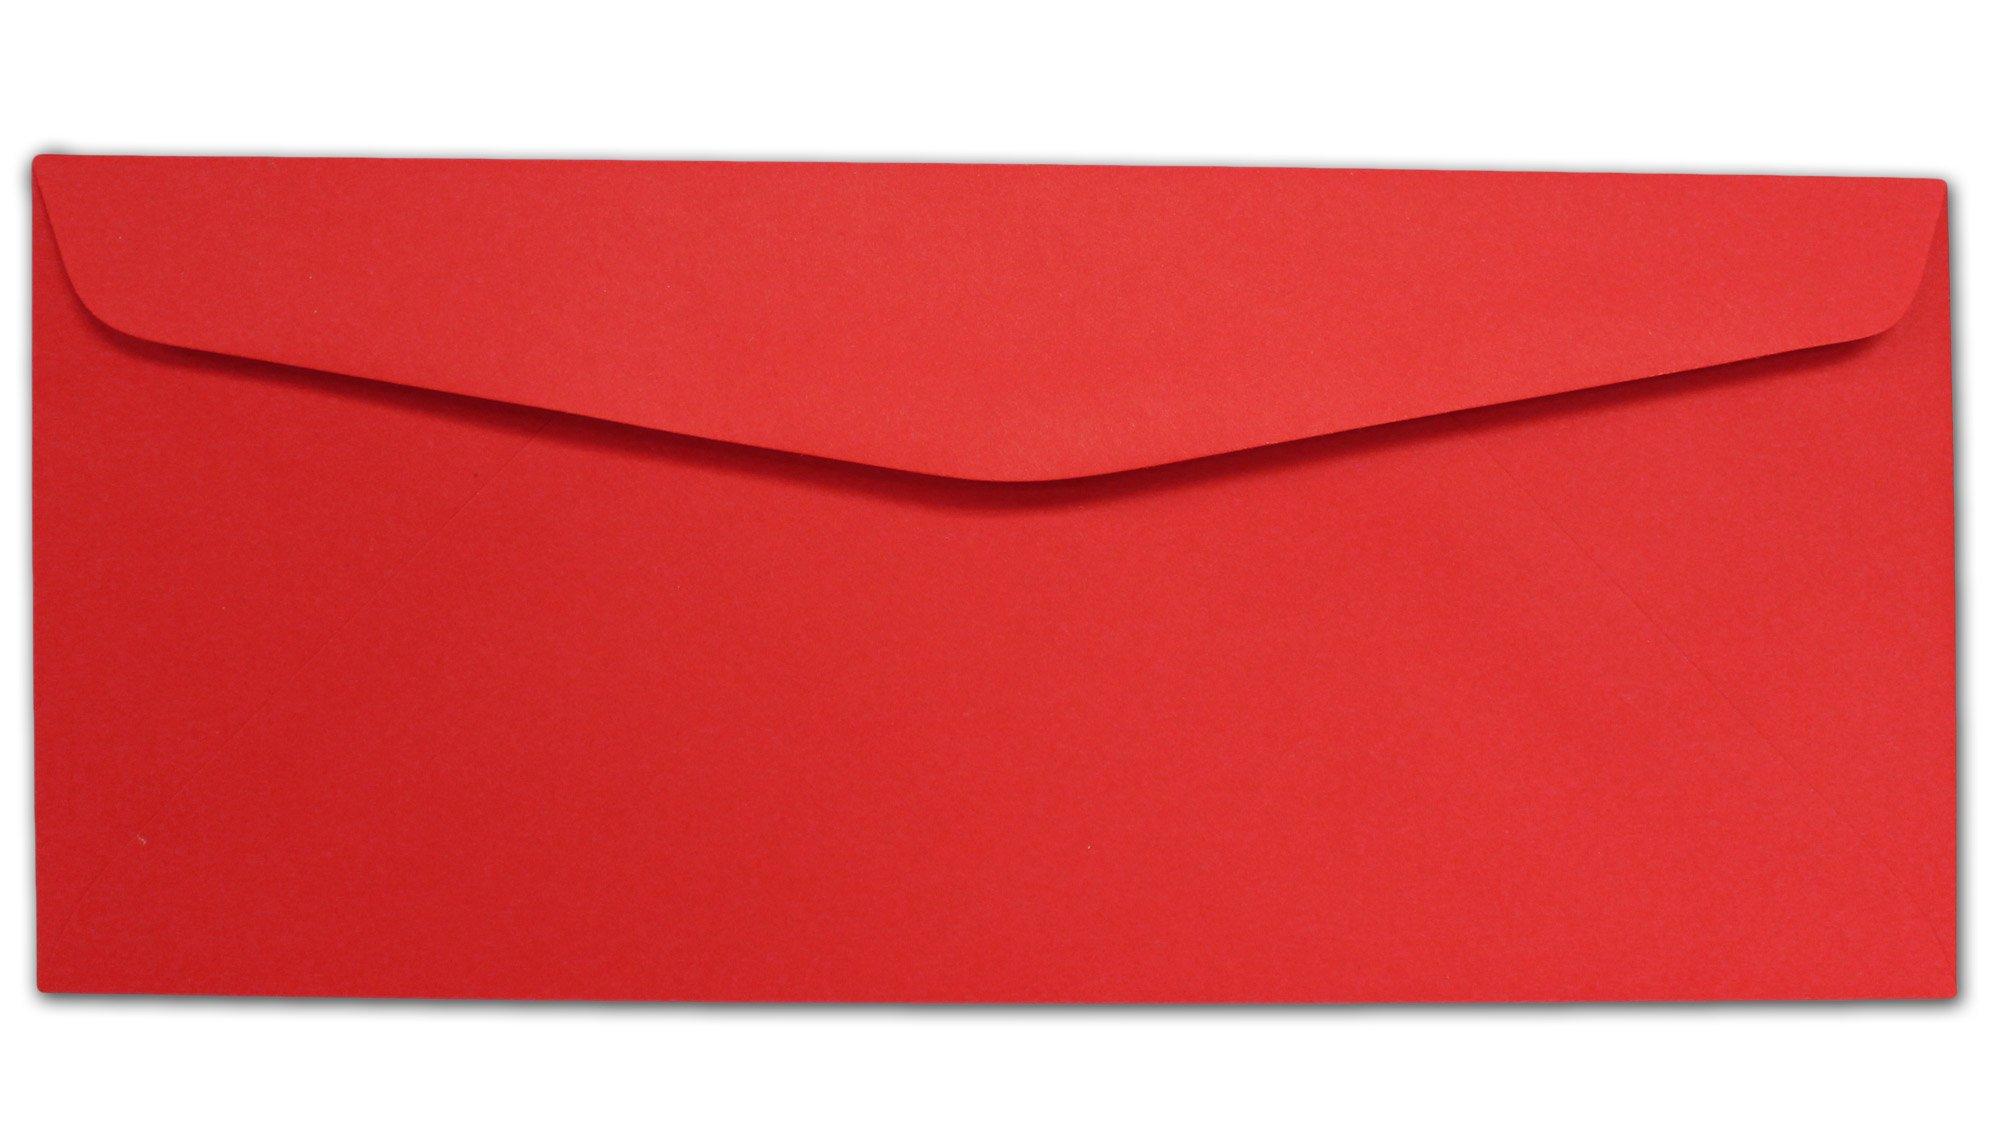 Red #10 Envelopes - 100 Envelopes - Desktop Publishing Supplies Brand Envelopes